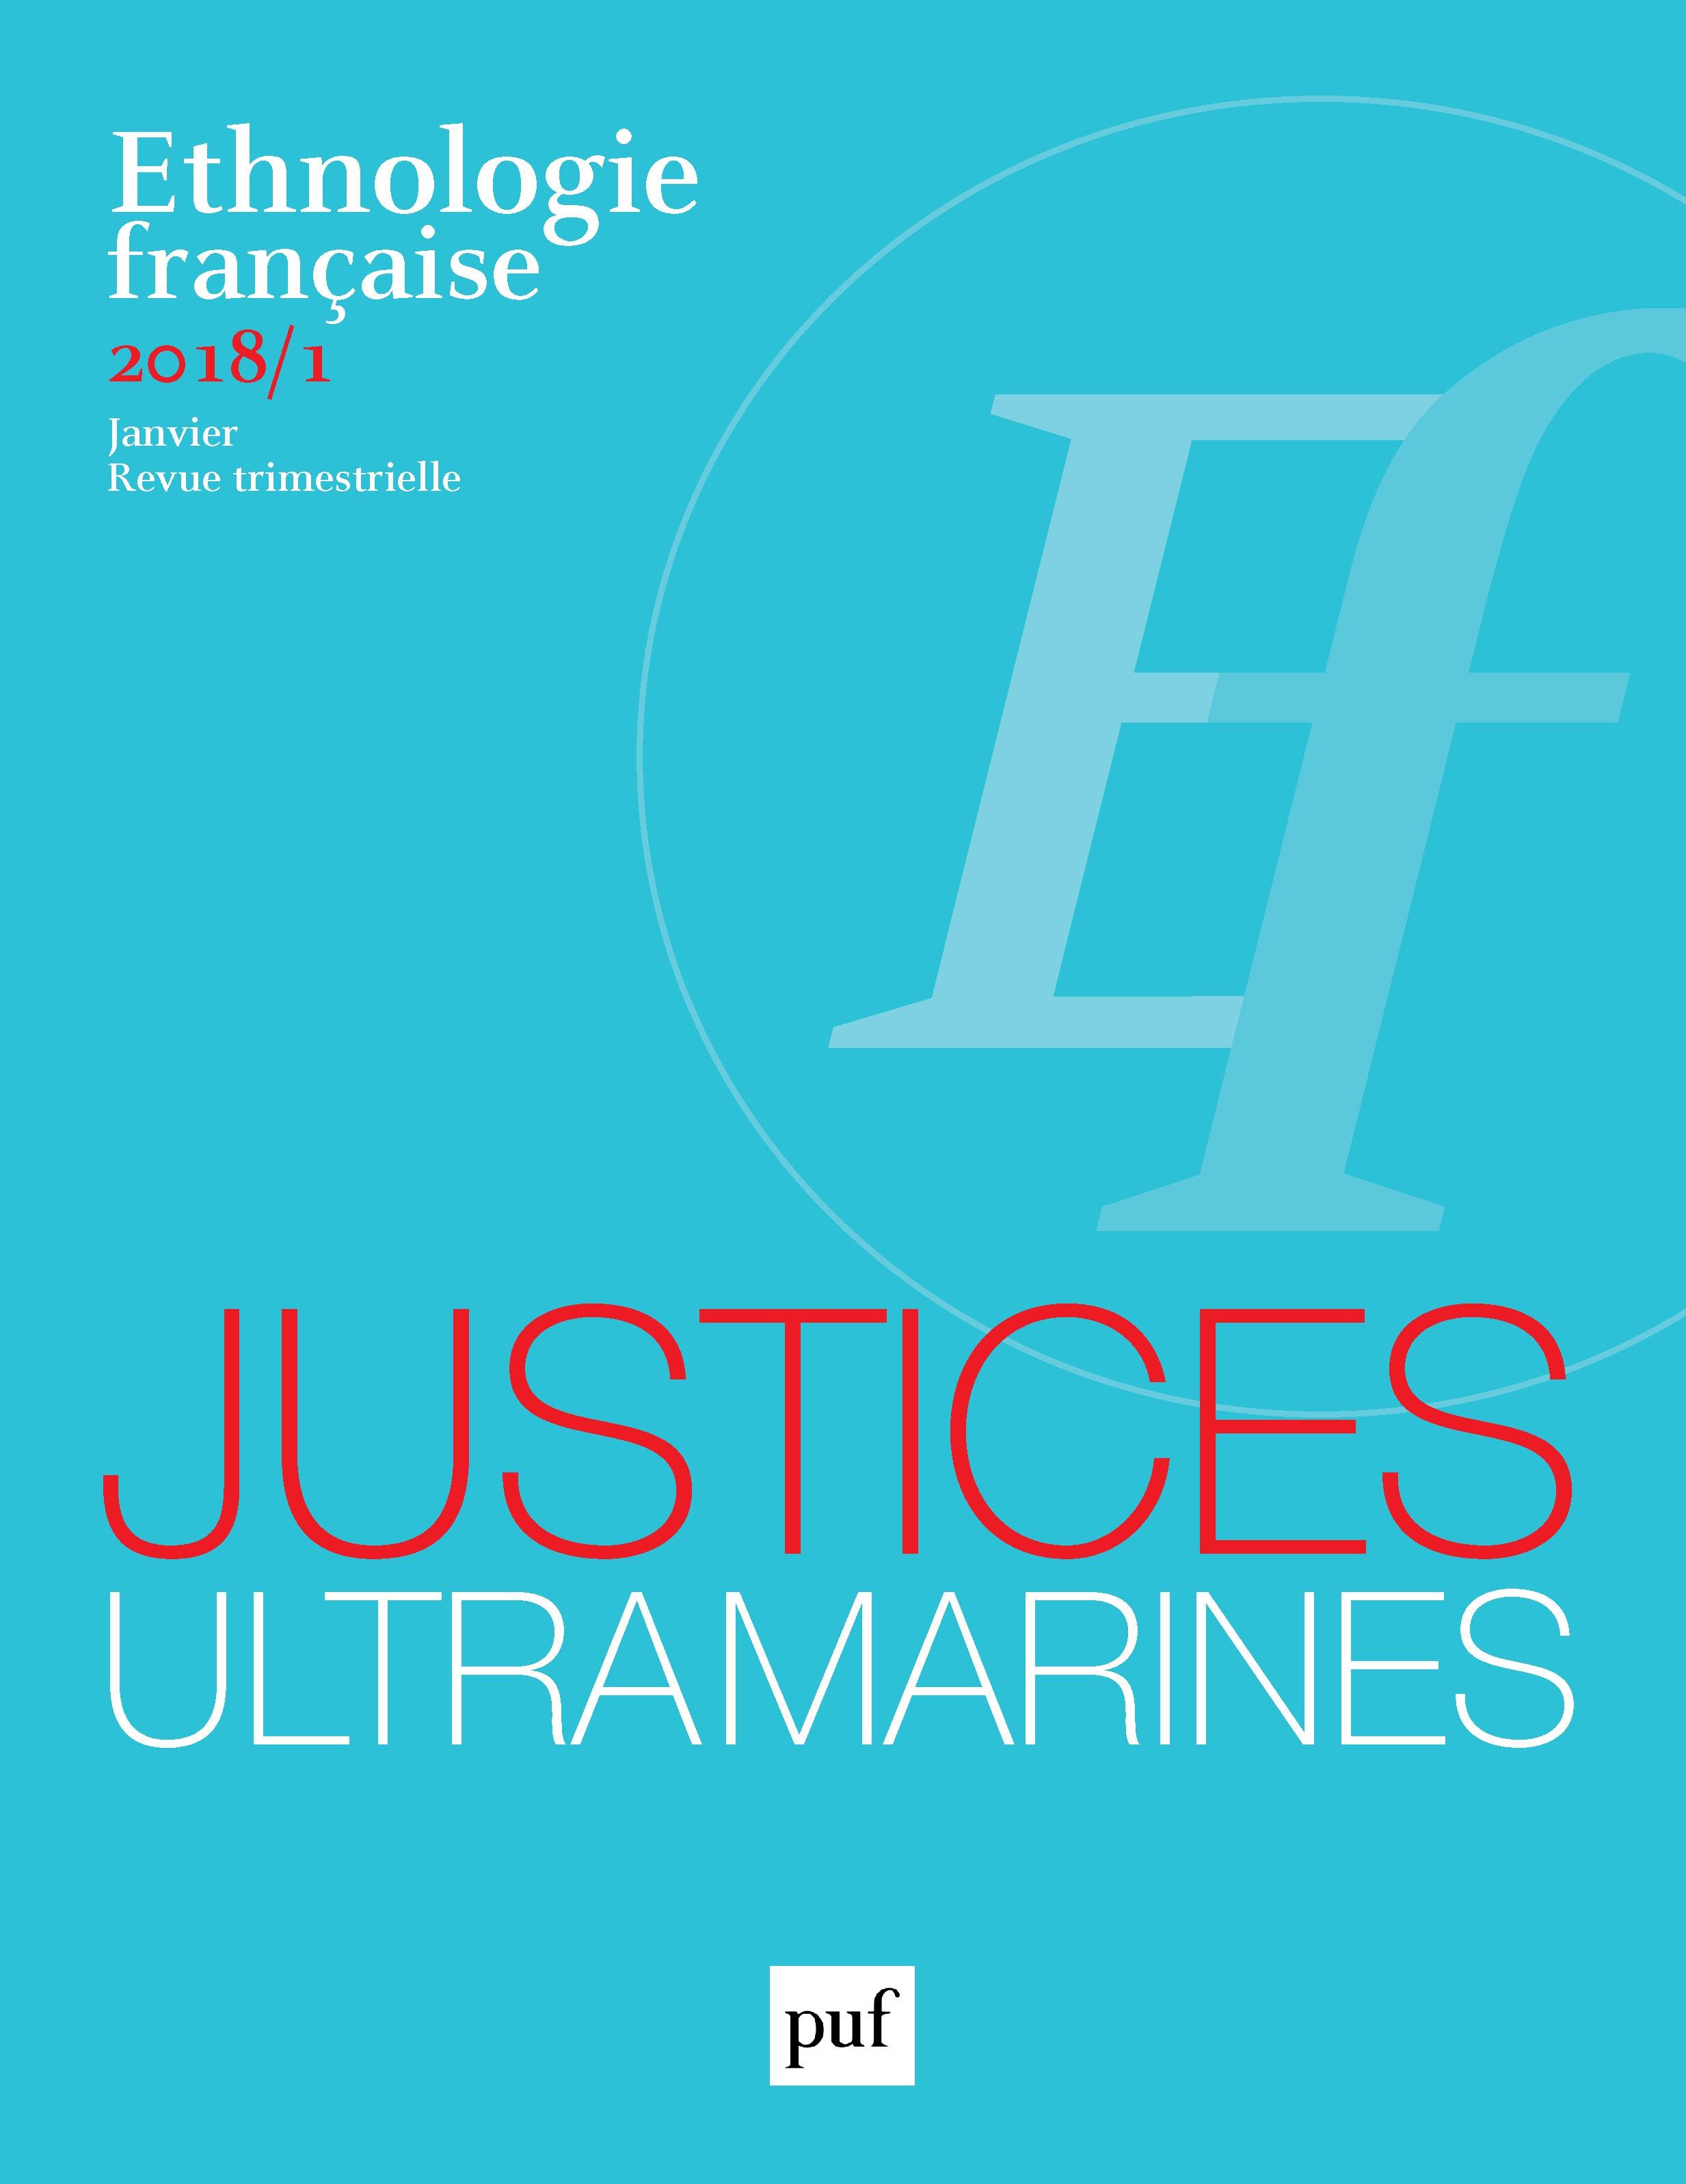 Justices ultramarines